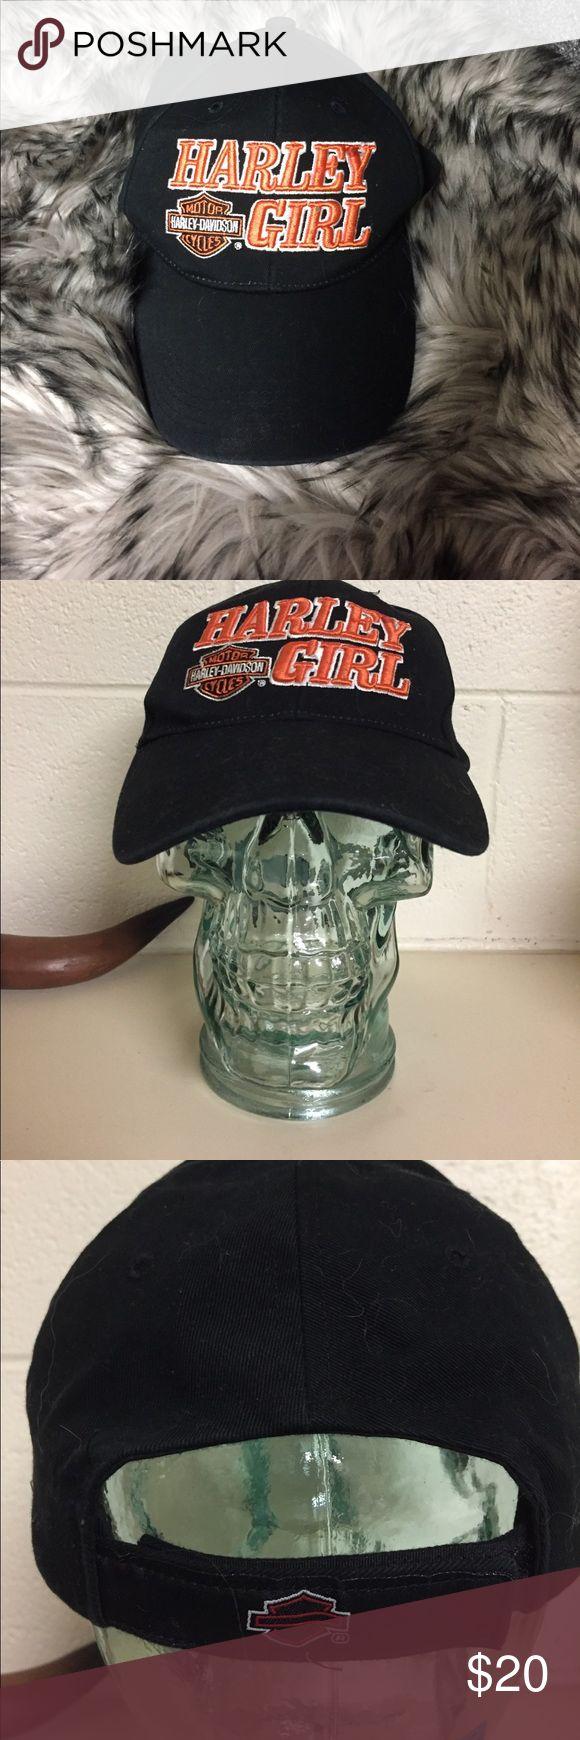 Harley Davidson hat Worn several times, great condition Harley-Davidson Accessories Hats